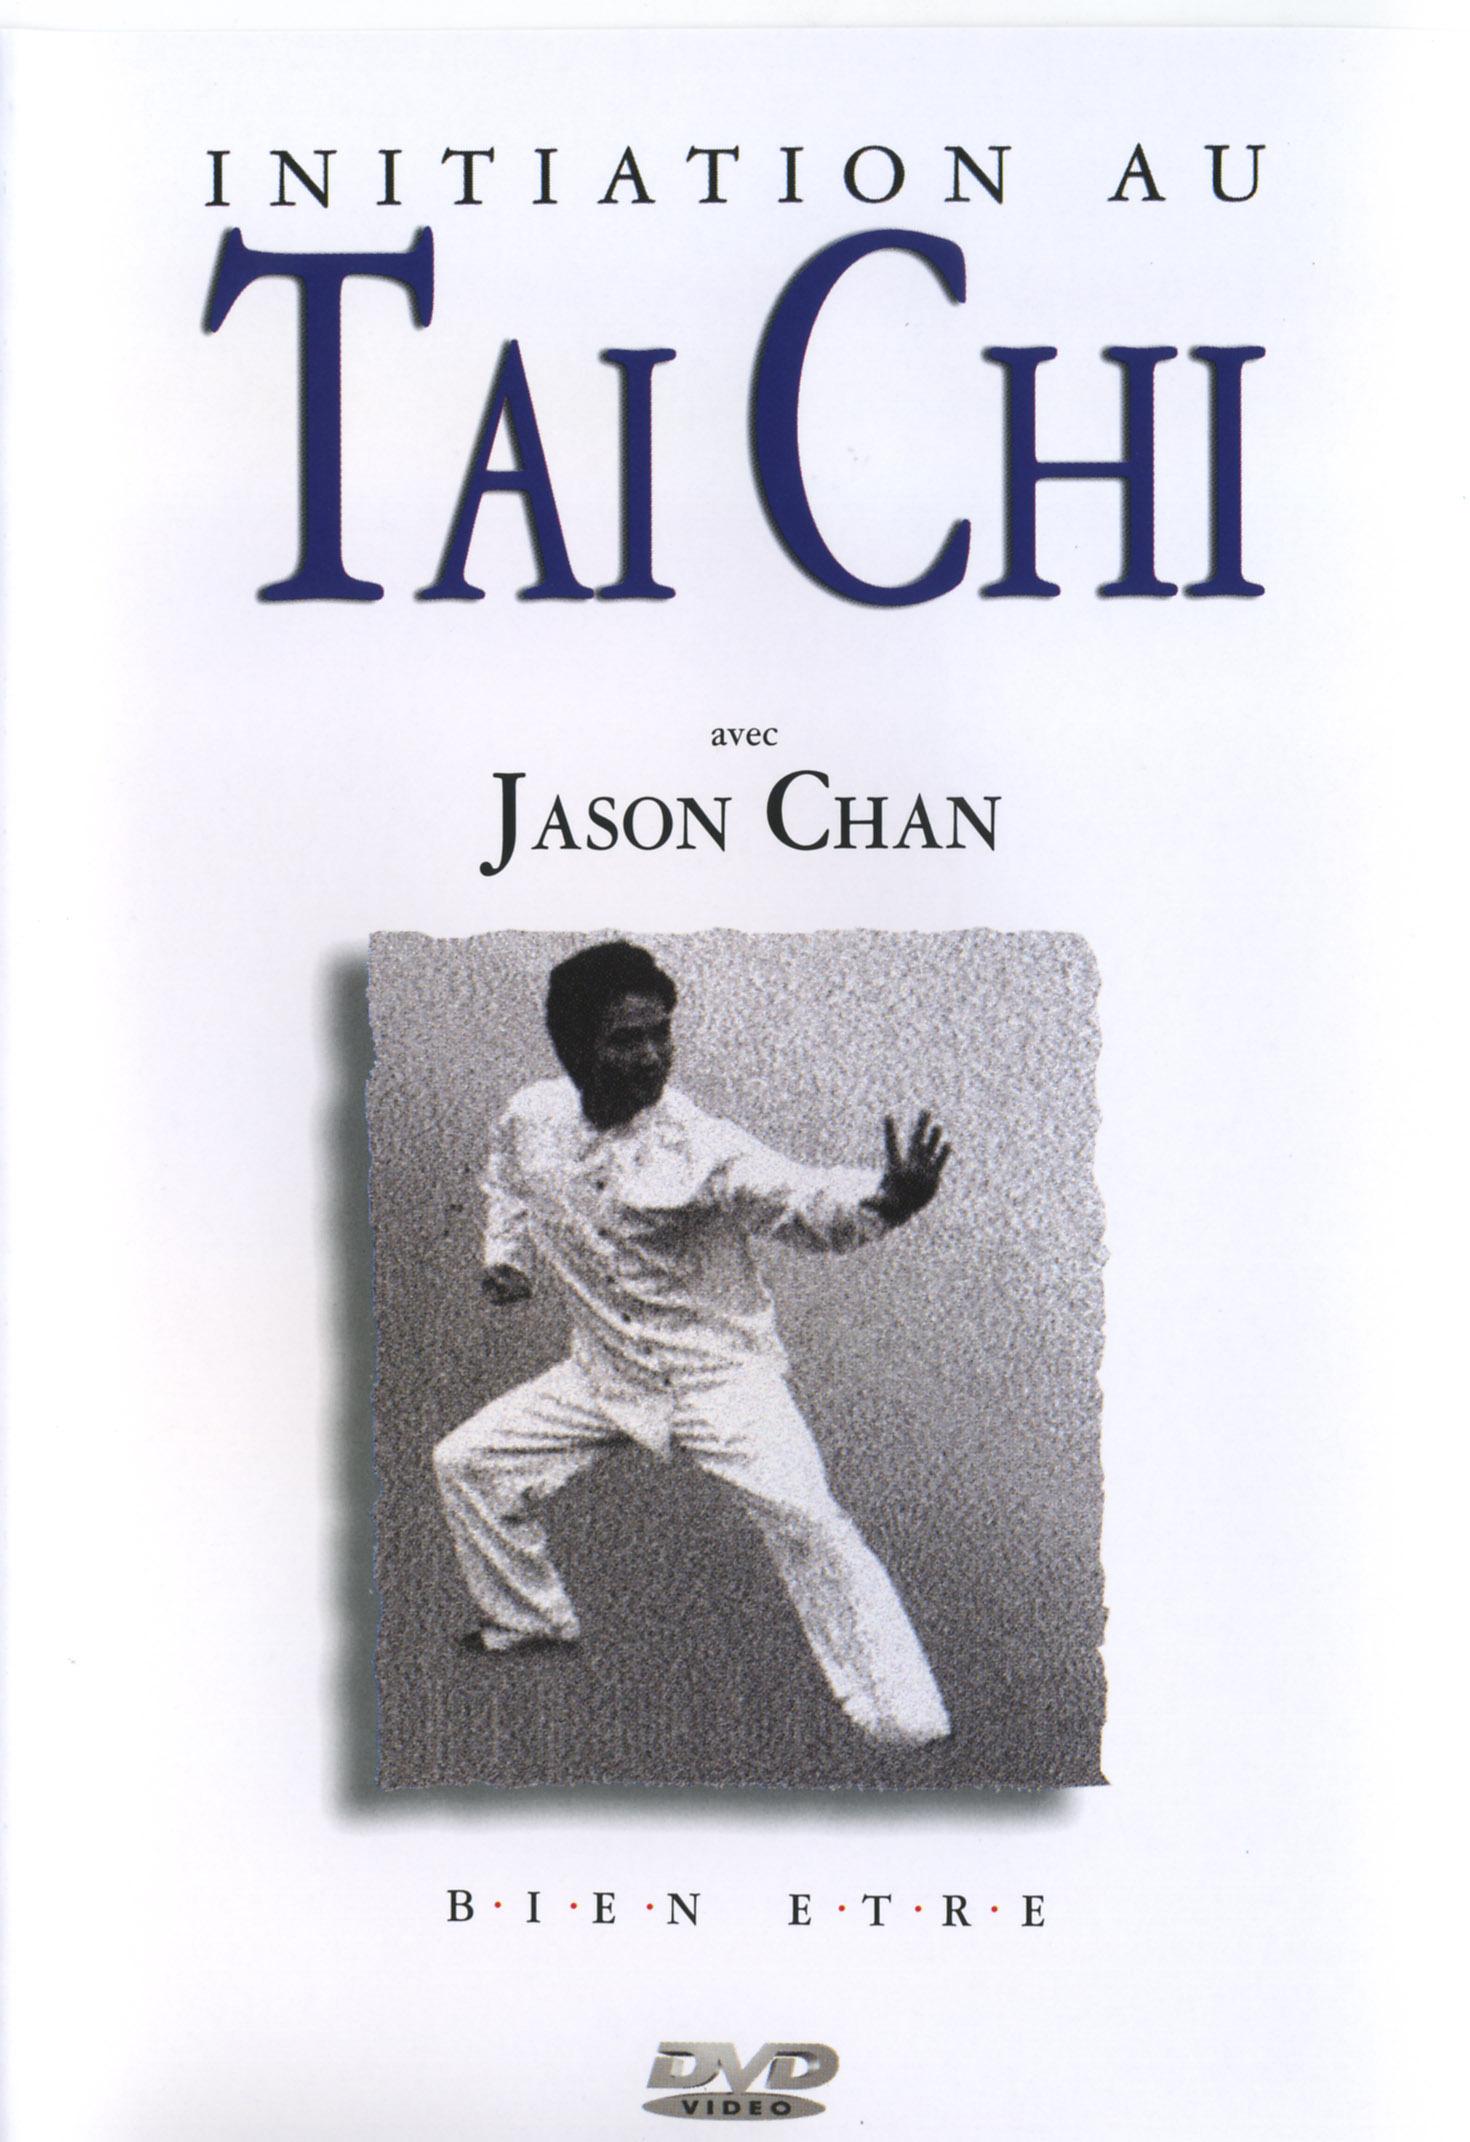 TAI CHI INITIATION - DVD